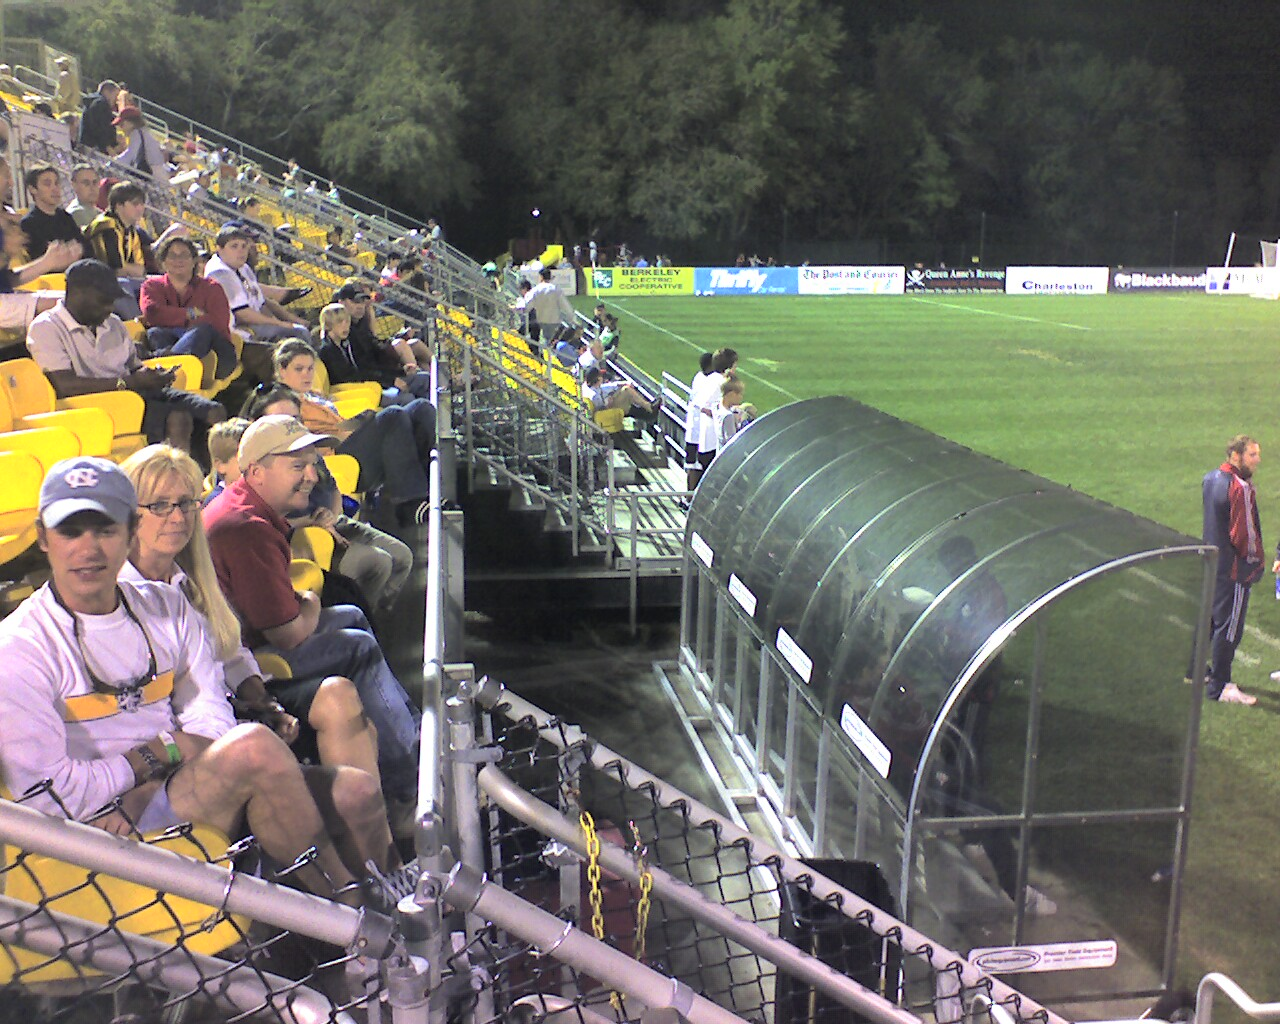 FileBlackbaud Stadium 1jpg   Wikimedia Commons 1280x1024